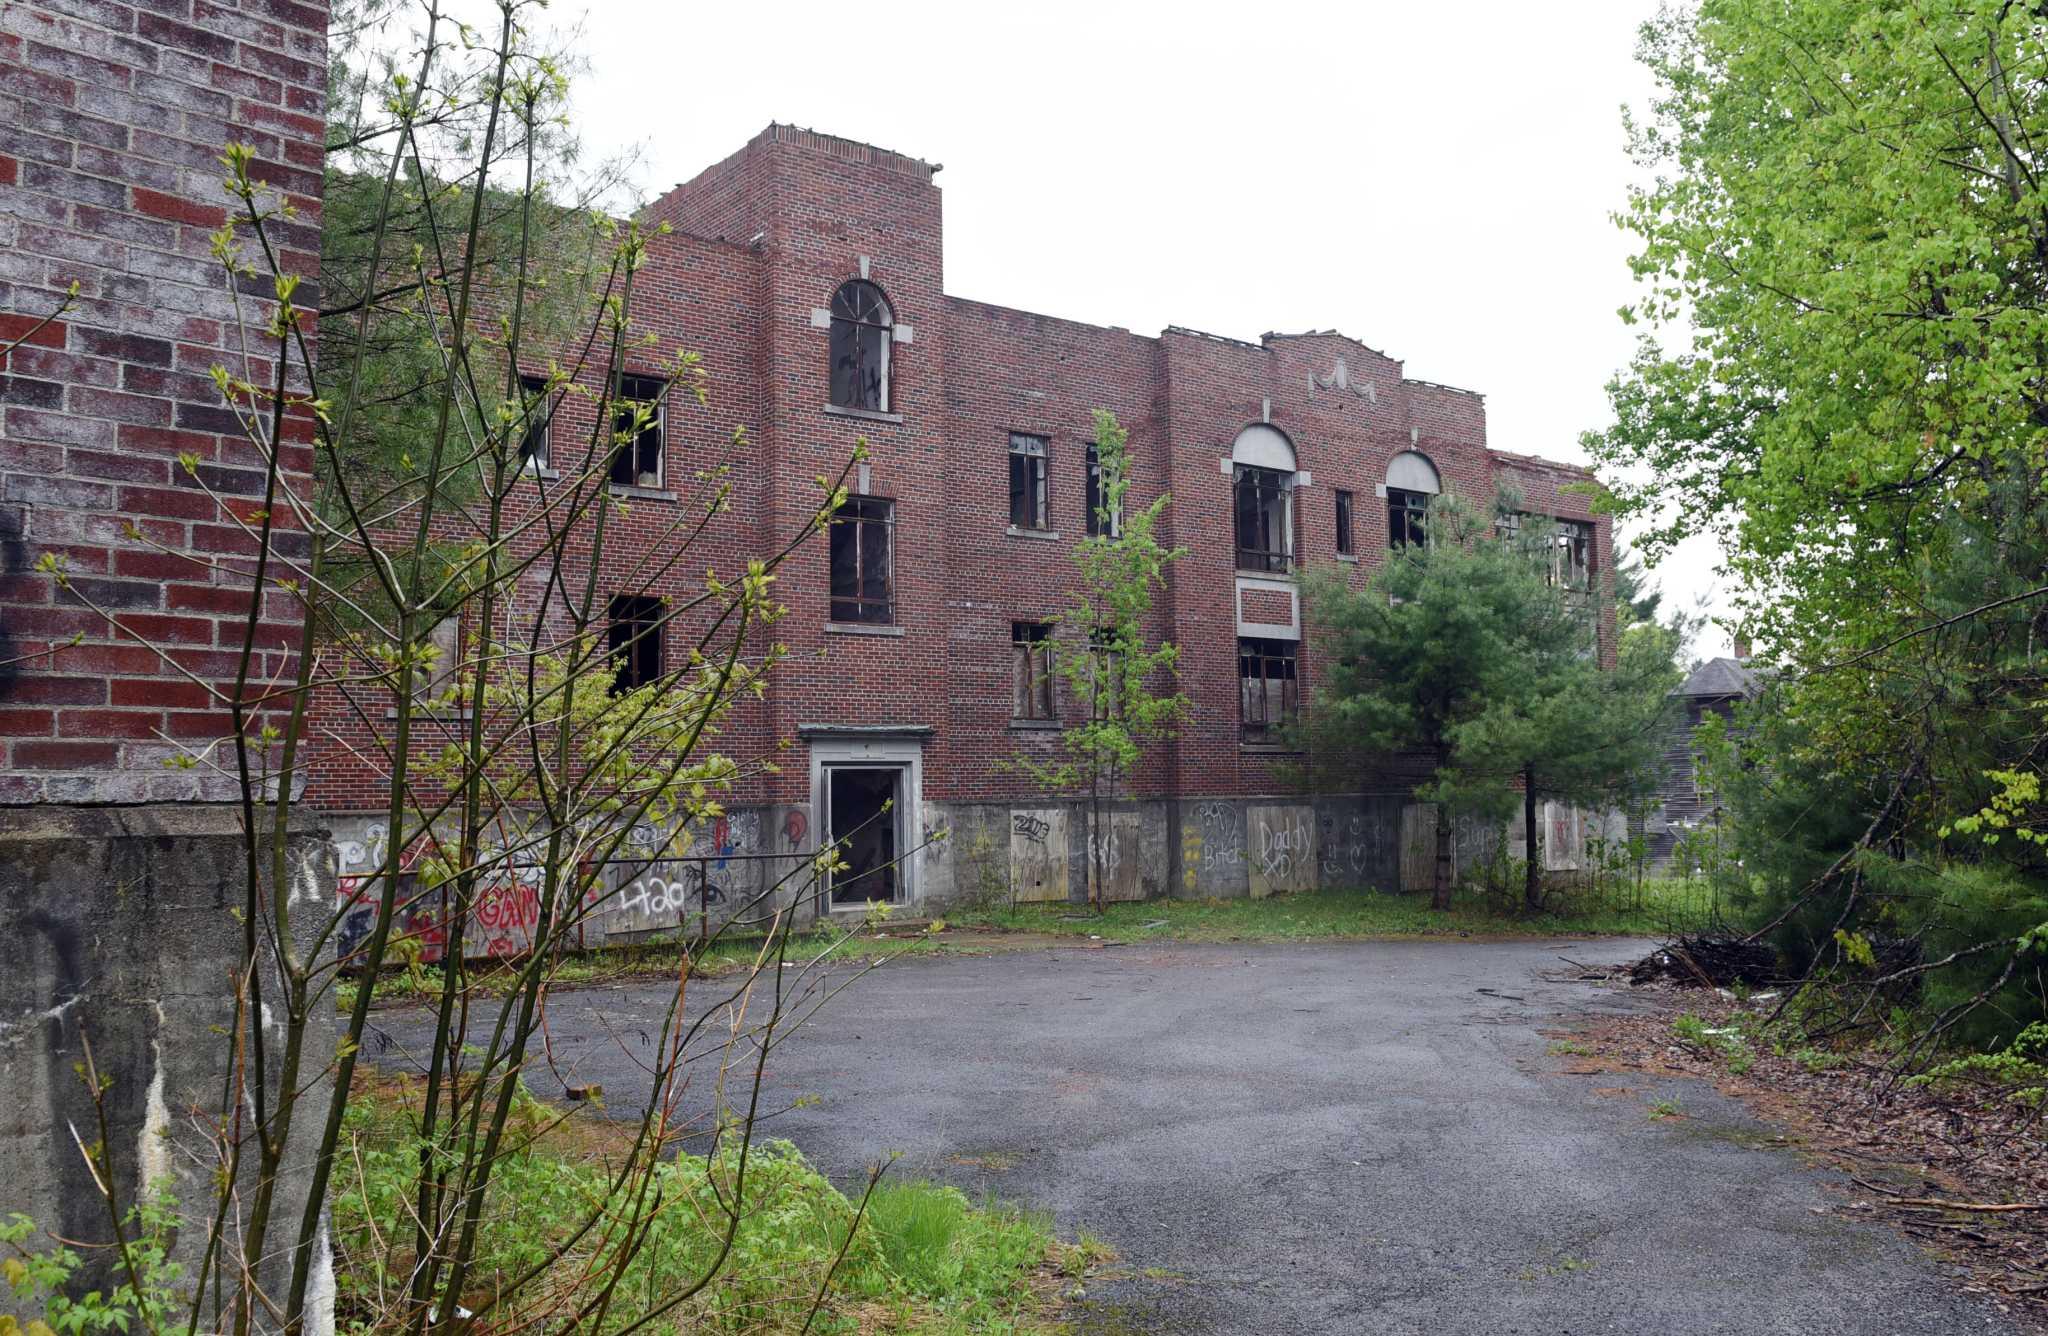 55 100 Is Top Bid For Vacant Saratoga County Asylum